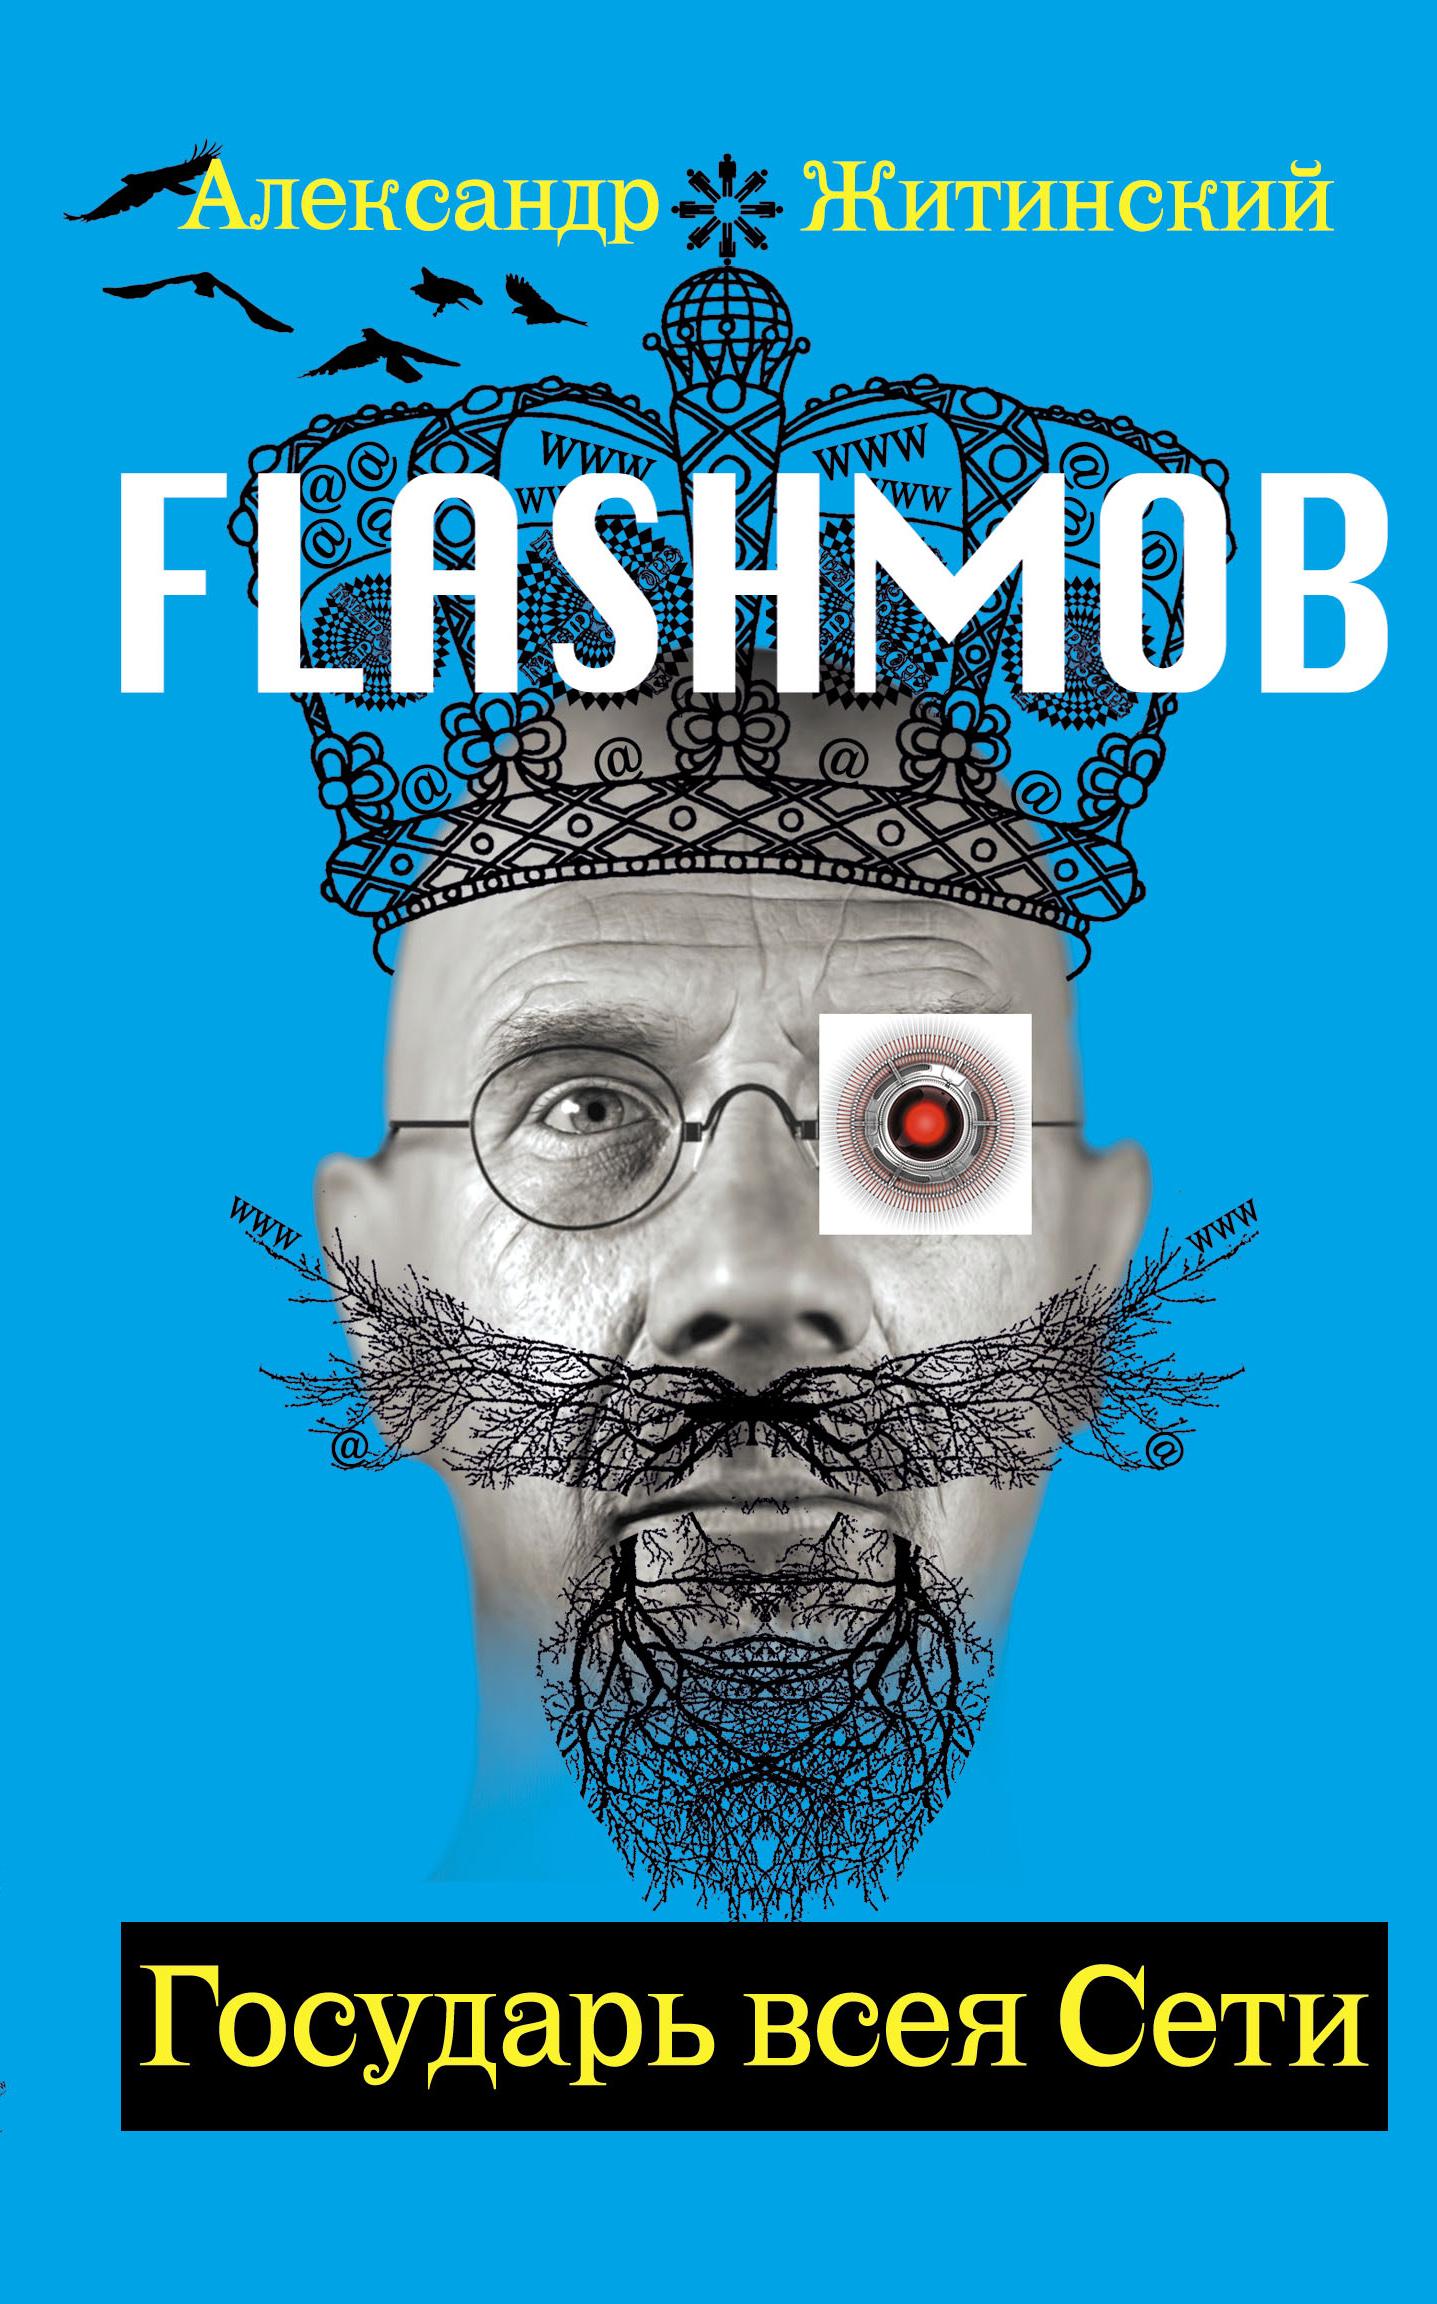 Александр Житинский Flashmob! Государь всея Сети